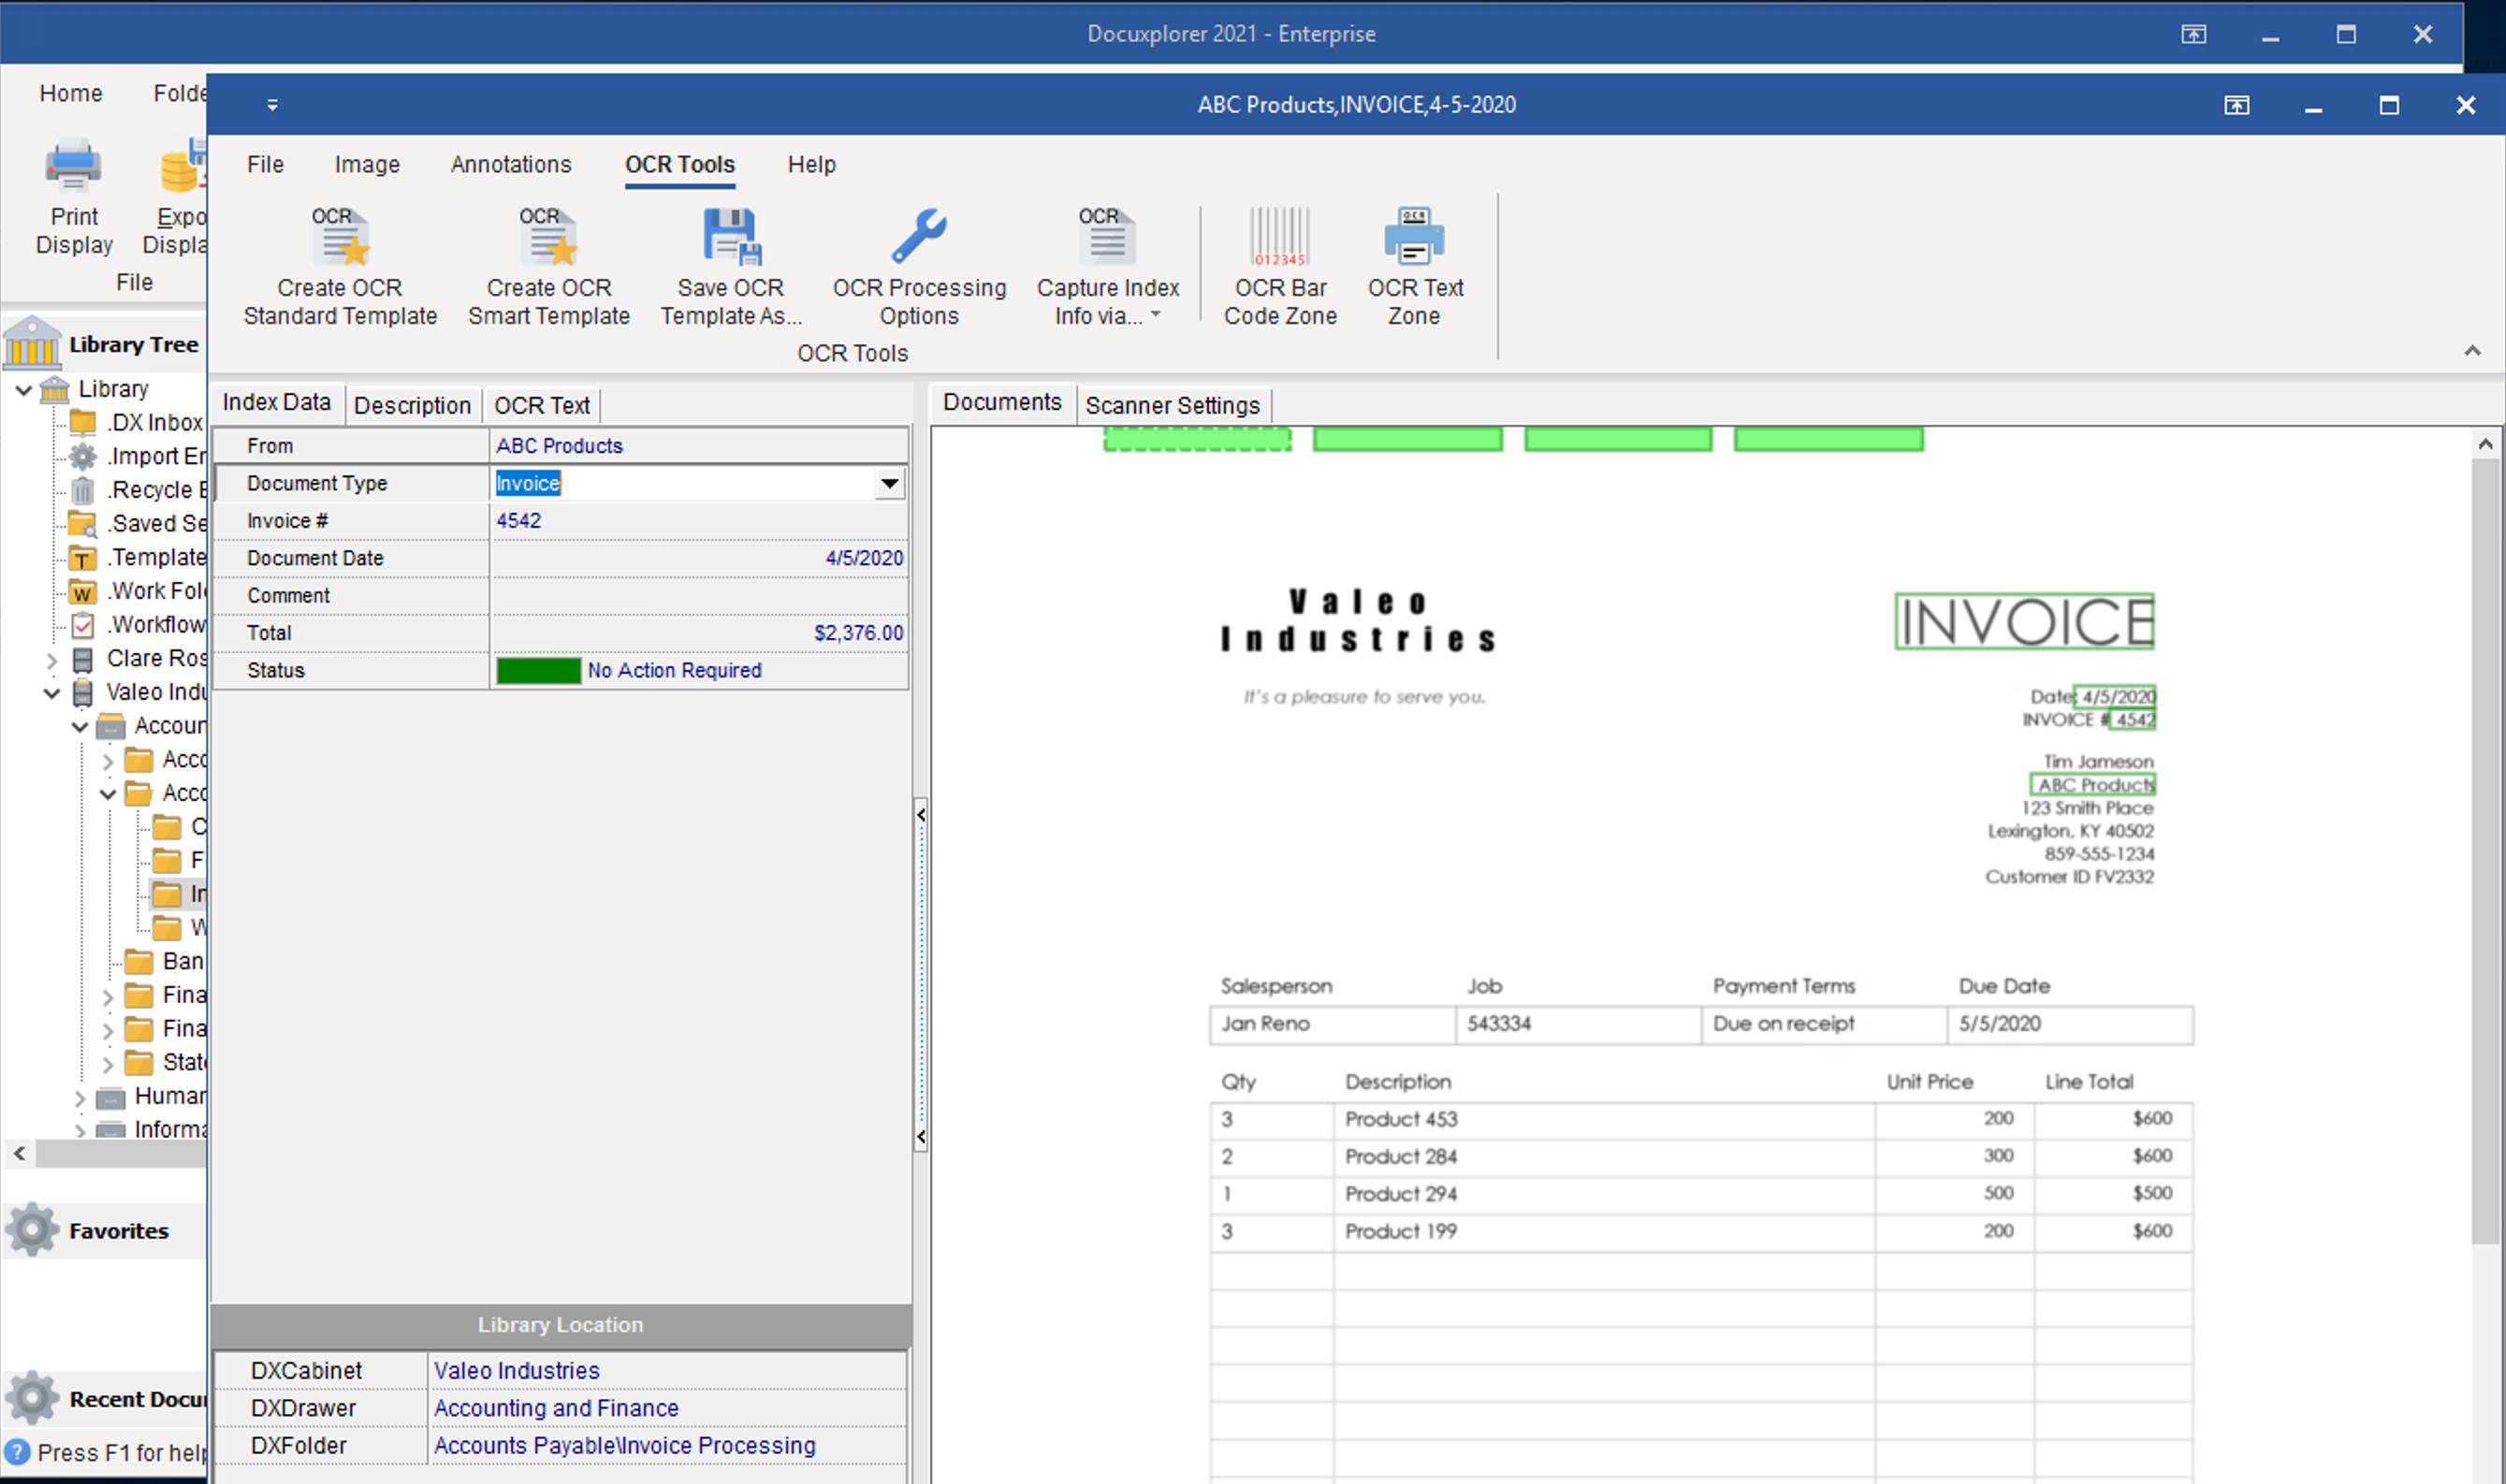 DocuXplorer Software - 3